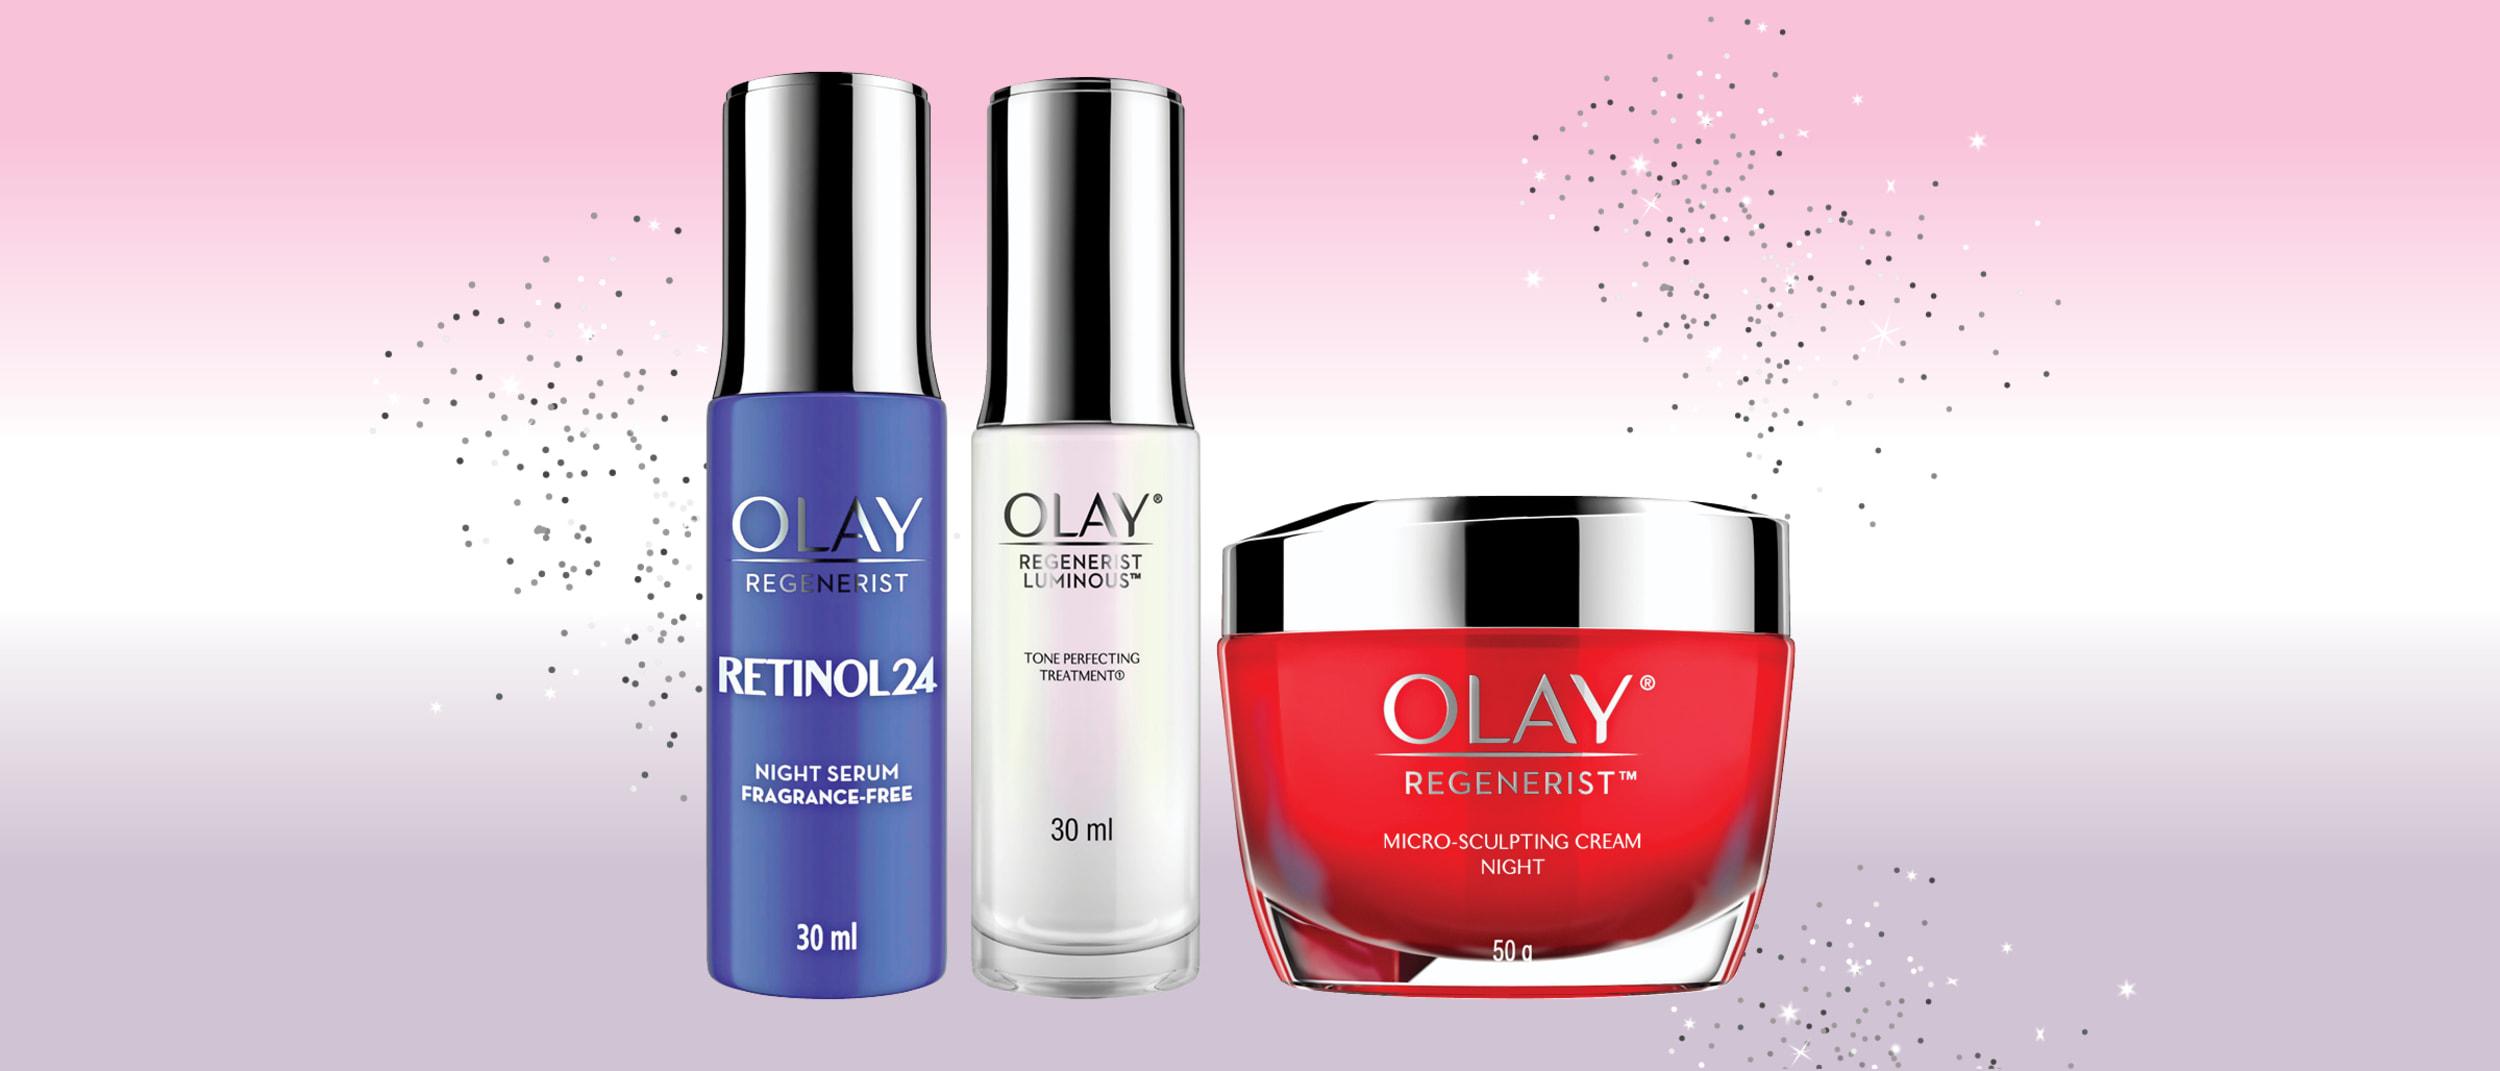 Priceline: Half-price on the Olay Skincare Range